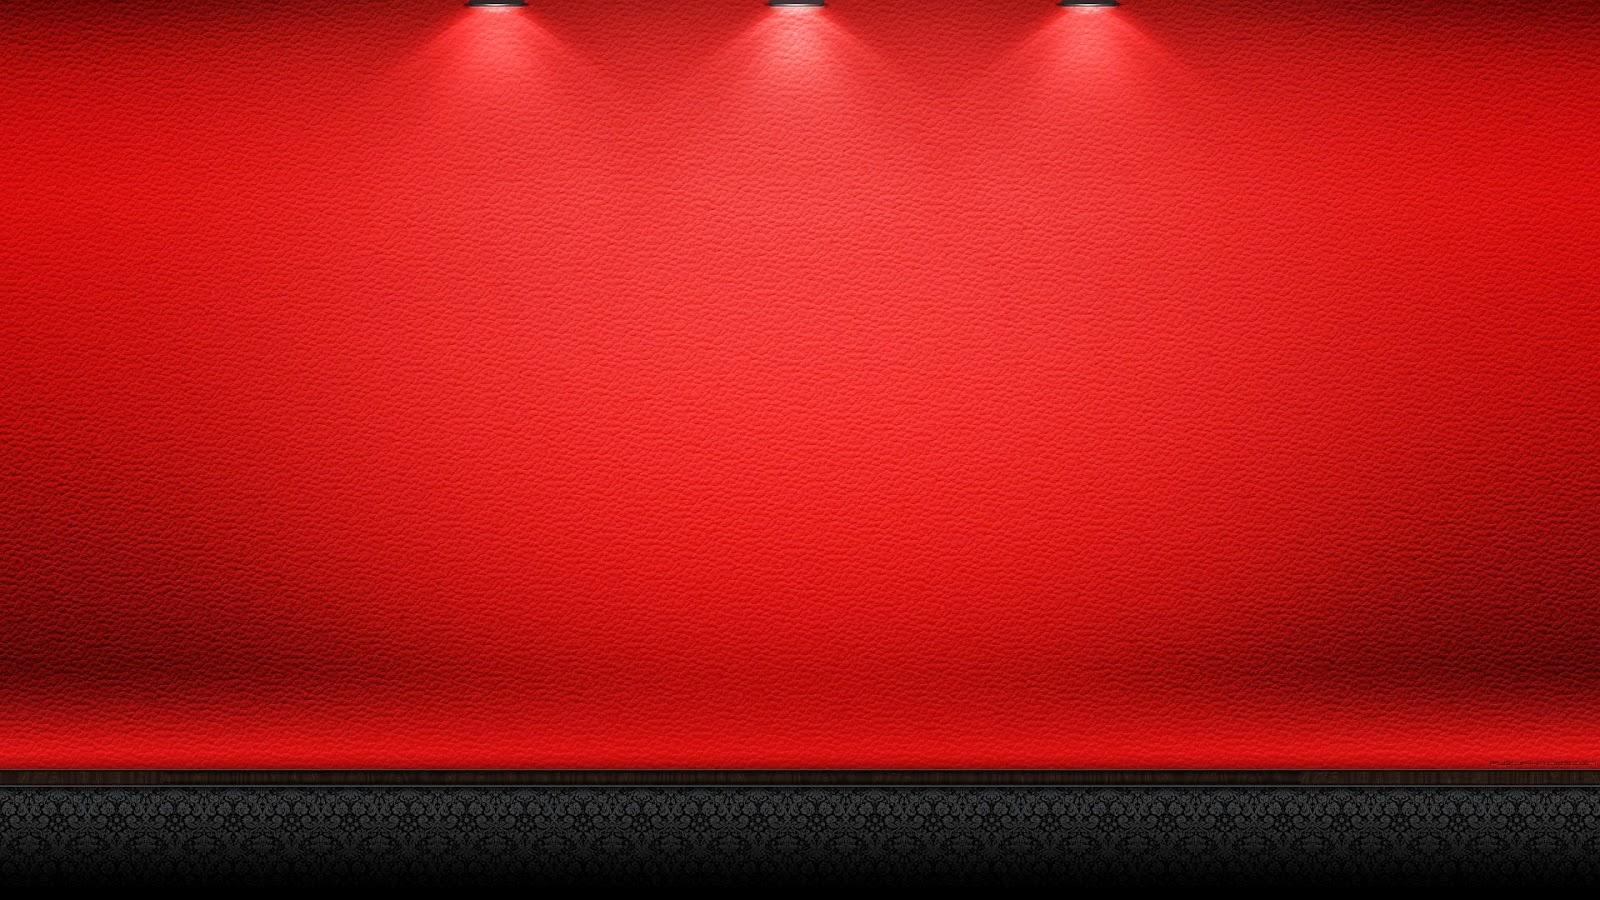 red and black wallpaper designs 1 desktop background - Red White Wallpaper